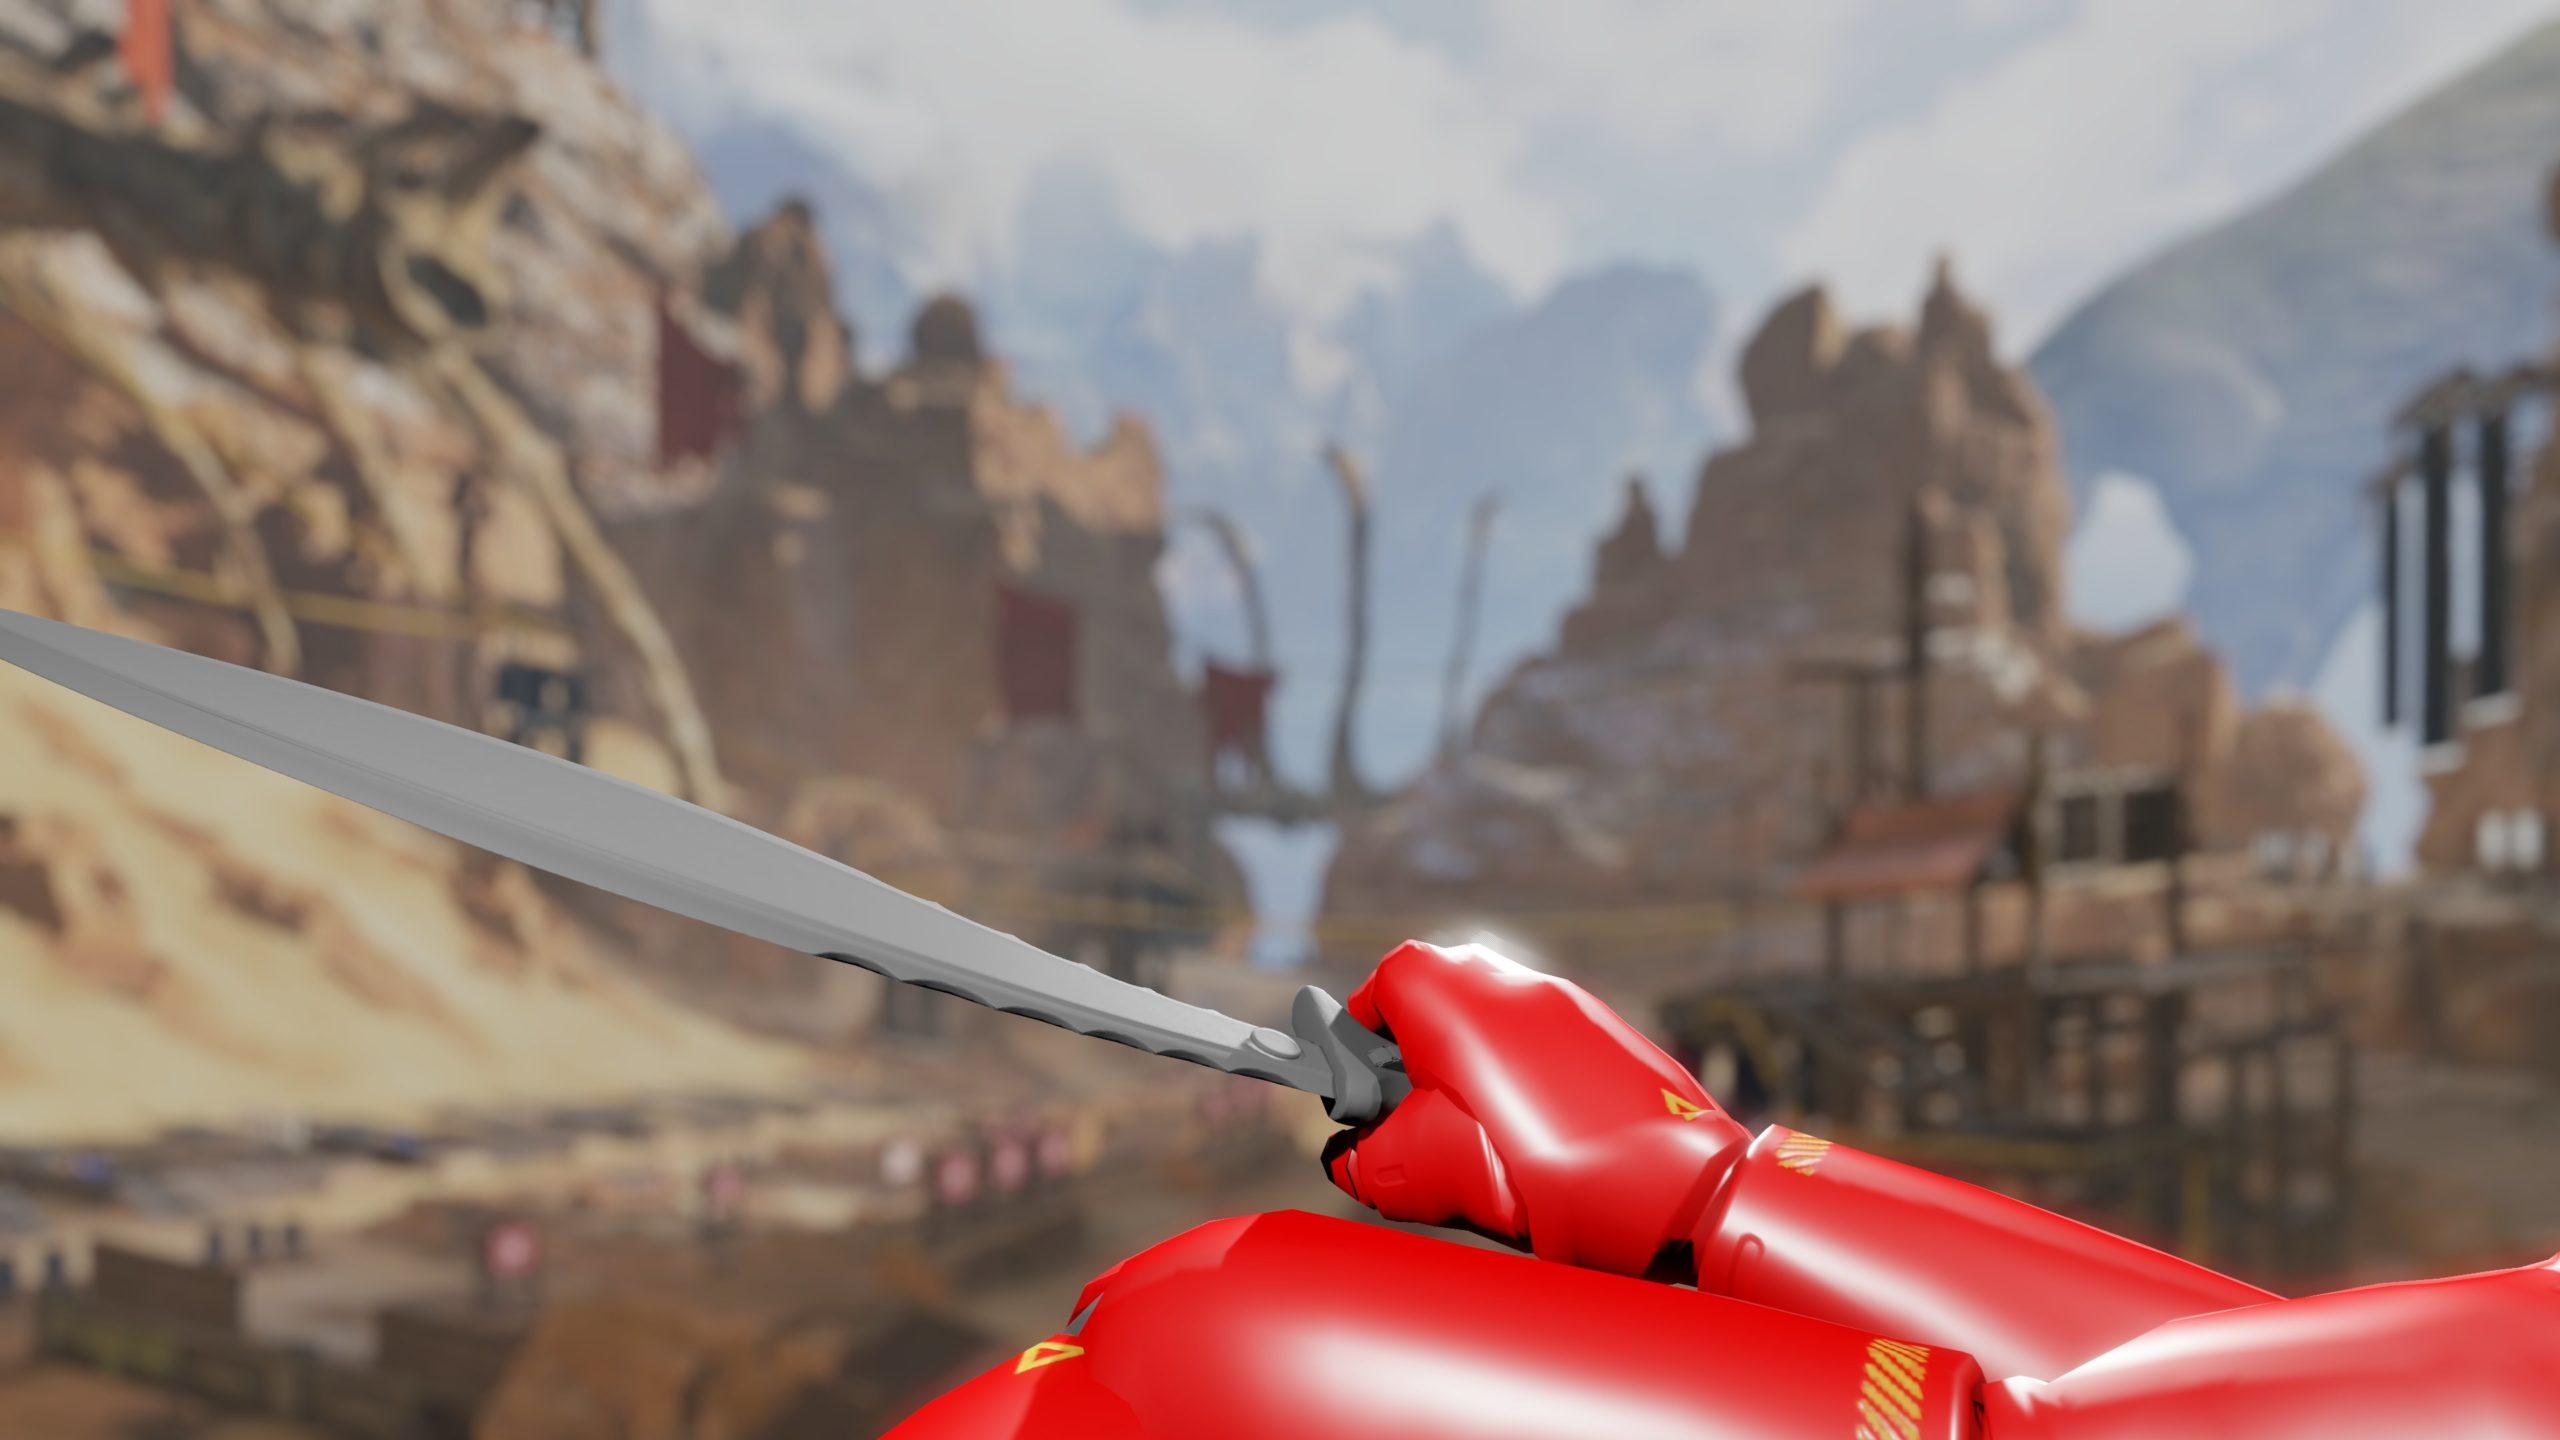 【!?】APEX最新アプデでゲームファイル内に「アッシュ」の剣が追加される